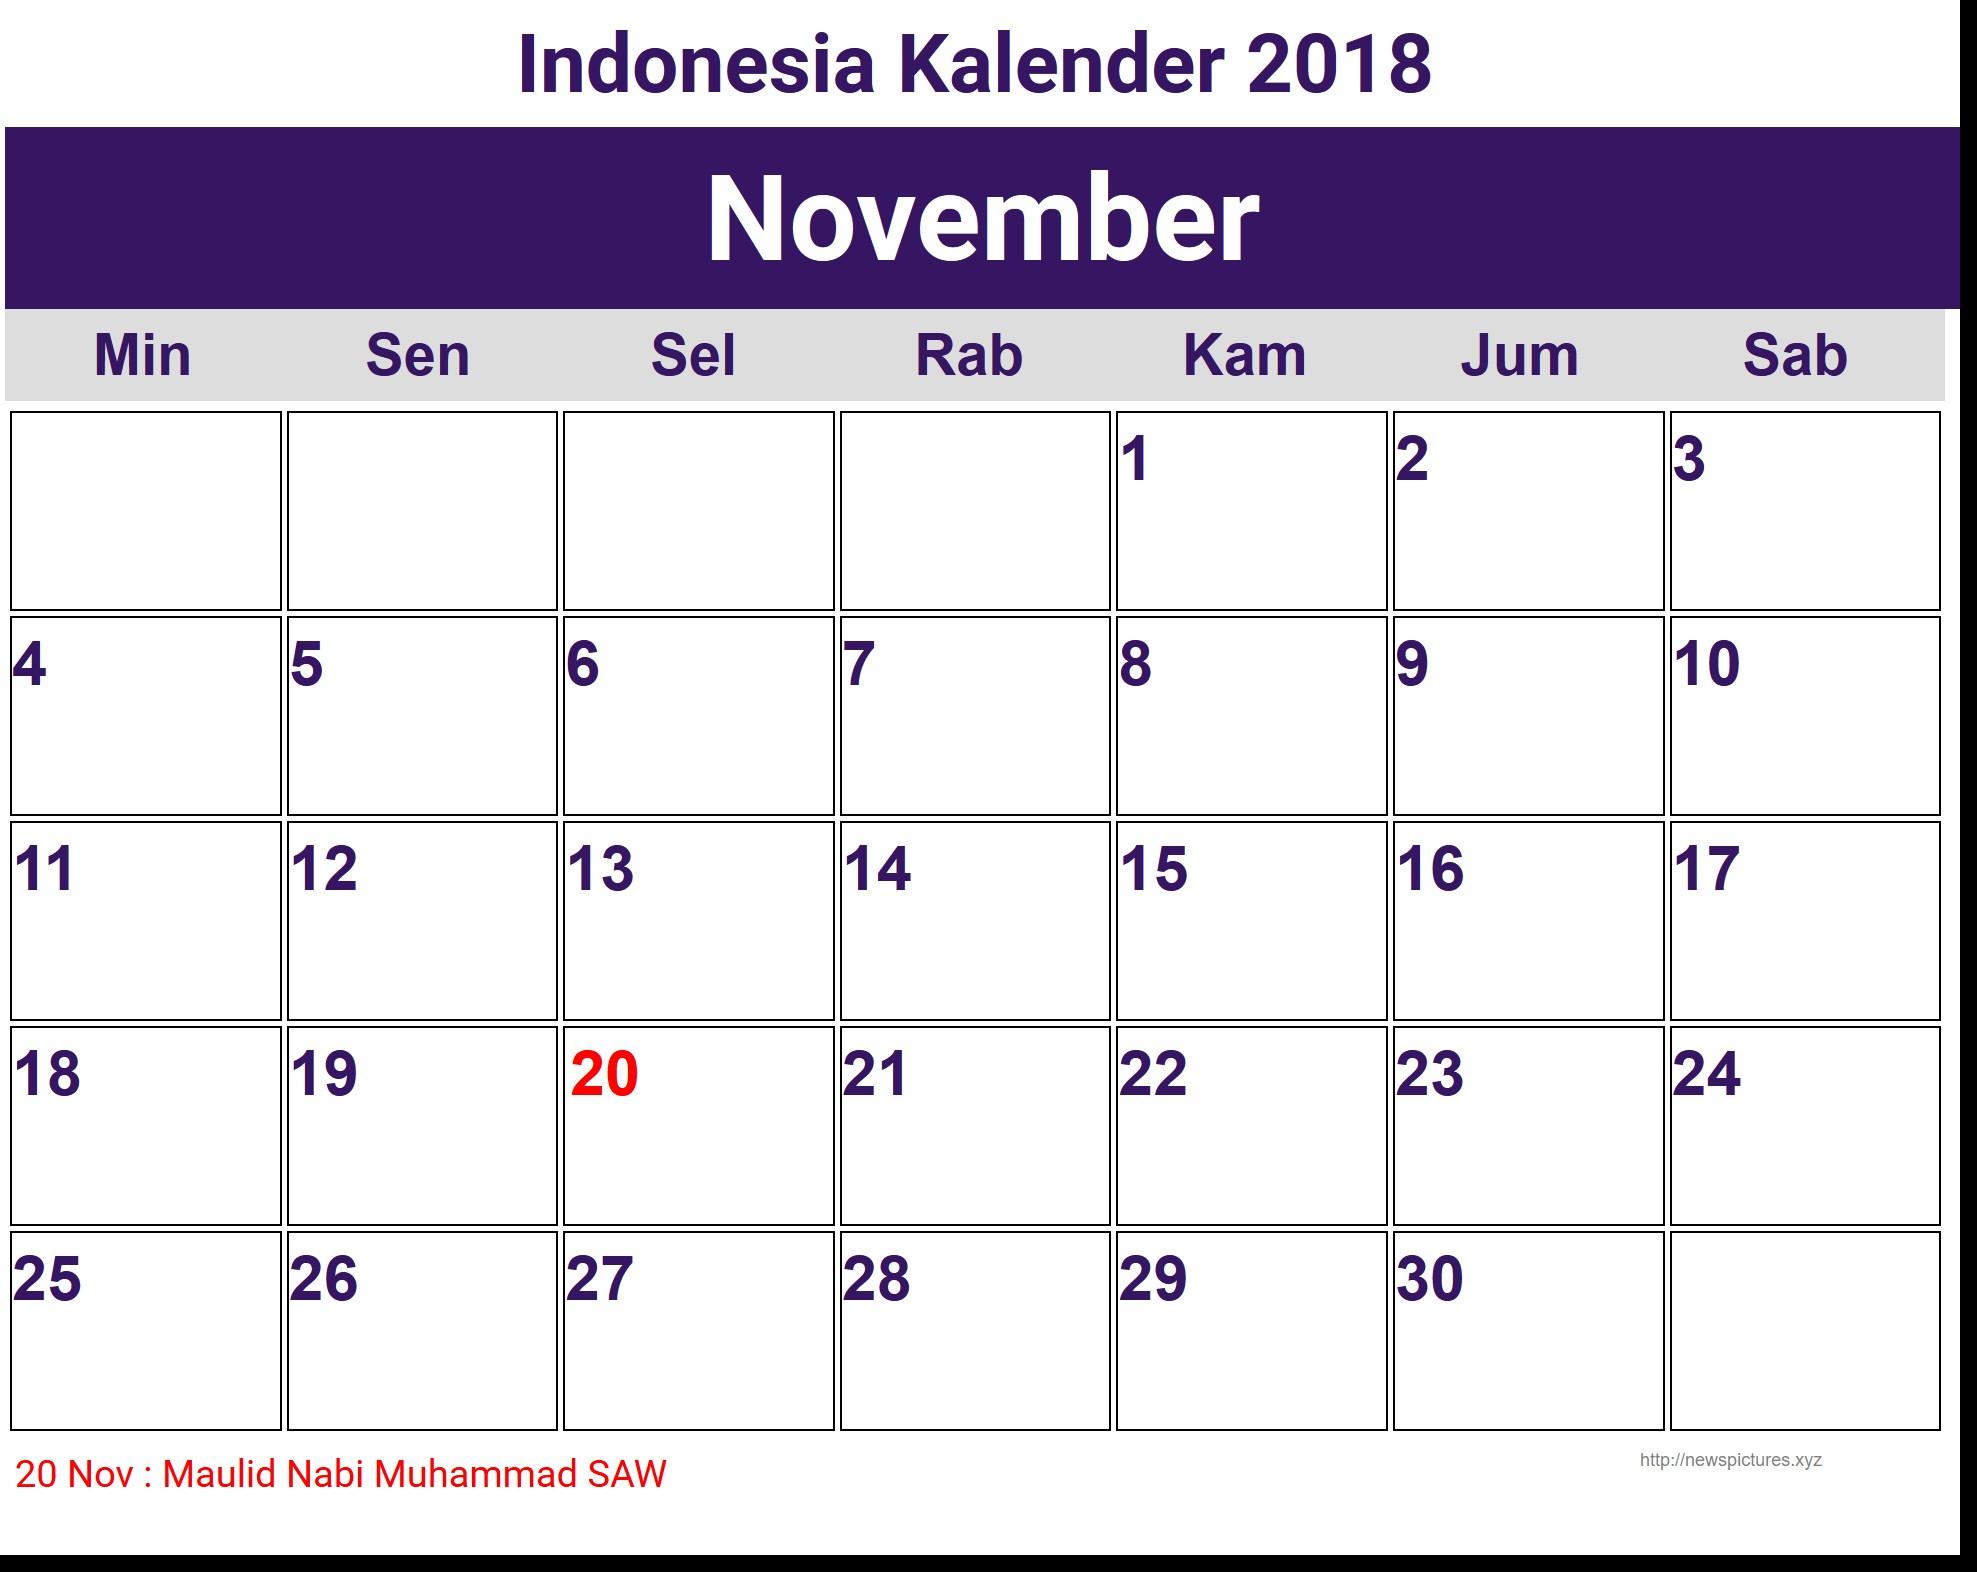 Kalender 2019 Excel Per Maand Más Actual Image for November Indonesia Kalender 2018 Kalender Of Kalender 2019 Excel Per Maand Más Caliente 39 Luxus Bilder Von Kalender 2016 Mit Feiertagen Bayern